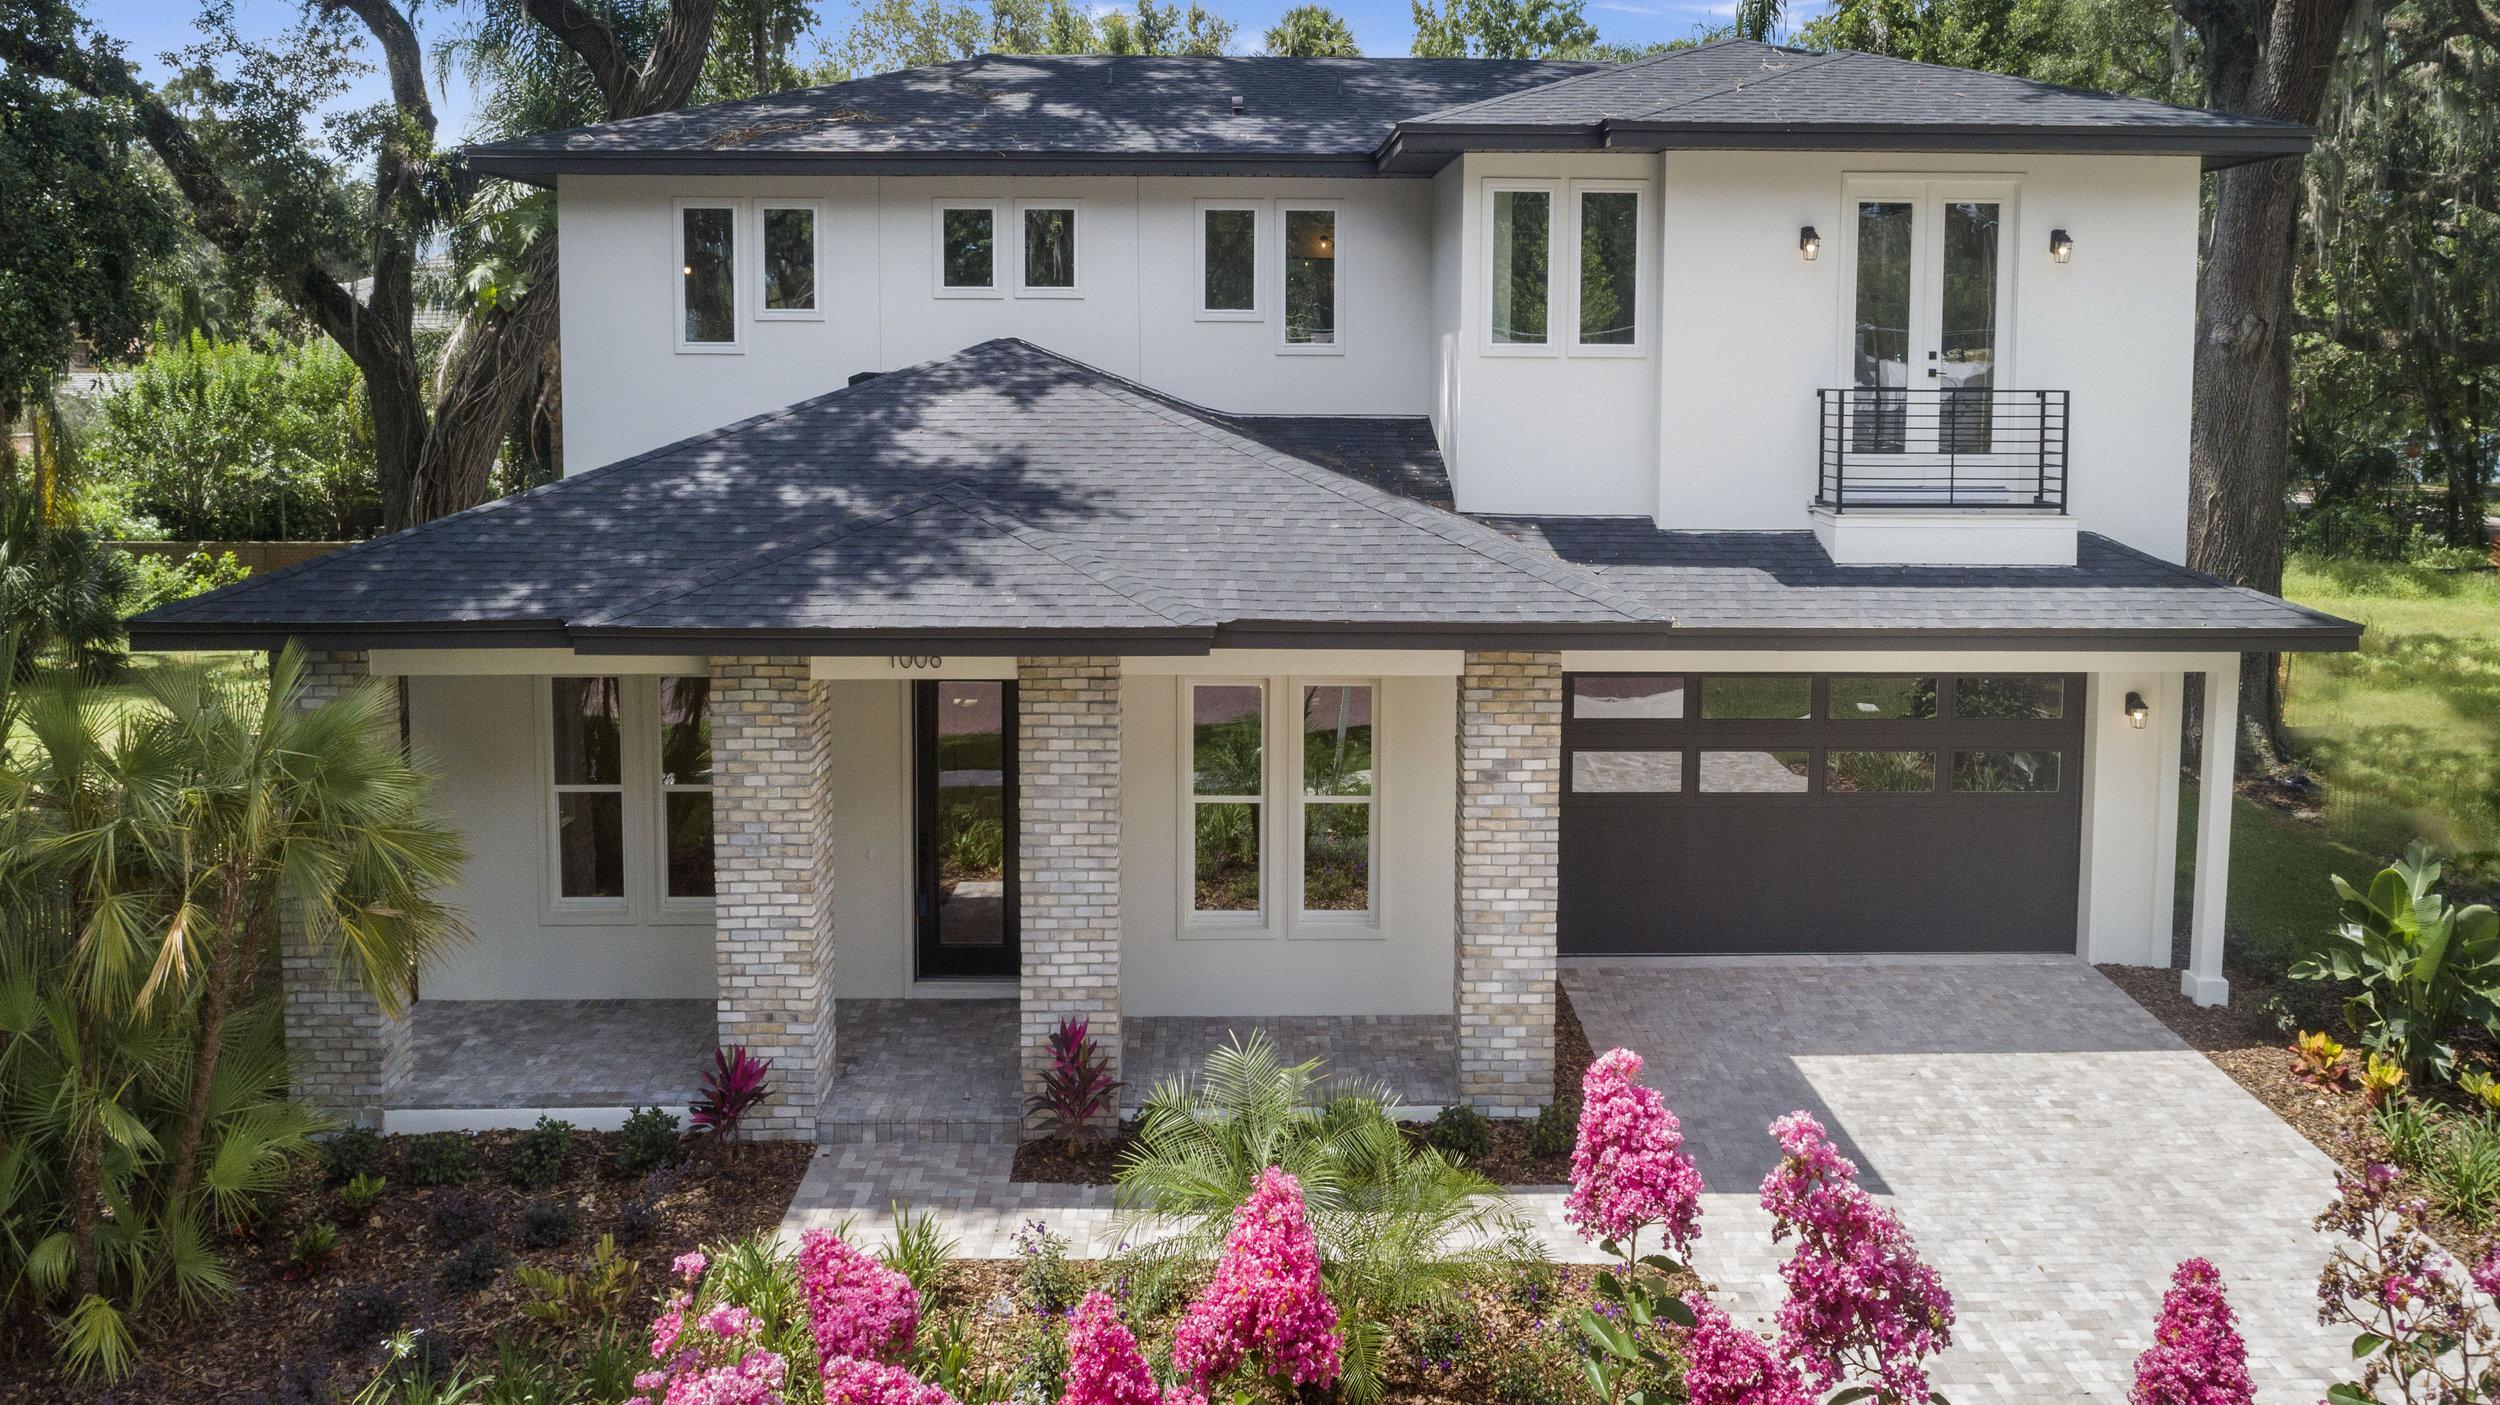 1008 Greenwood St, Orlando_DJI_0948.jpg